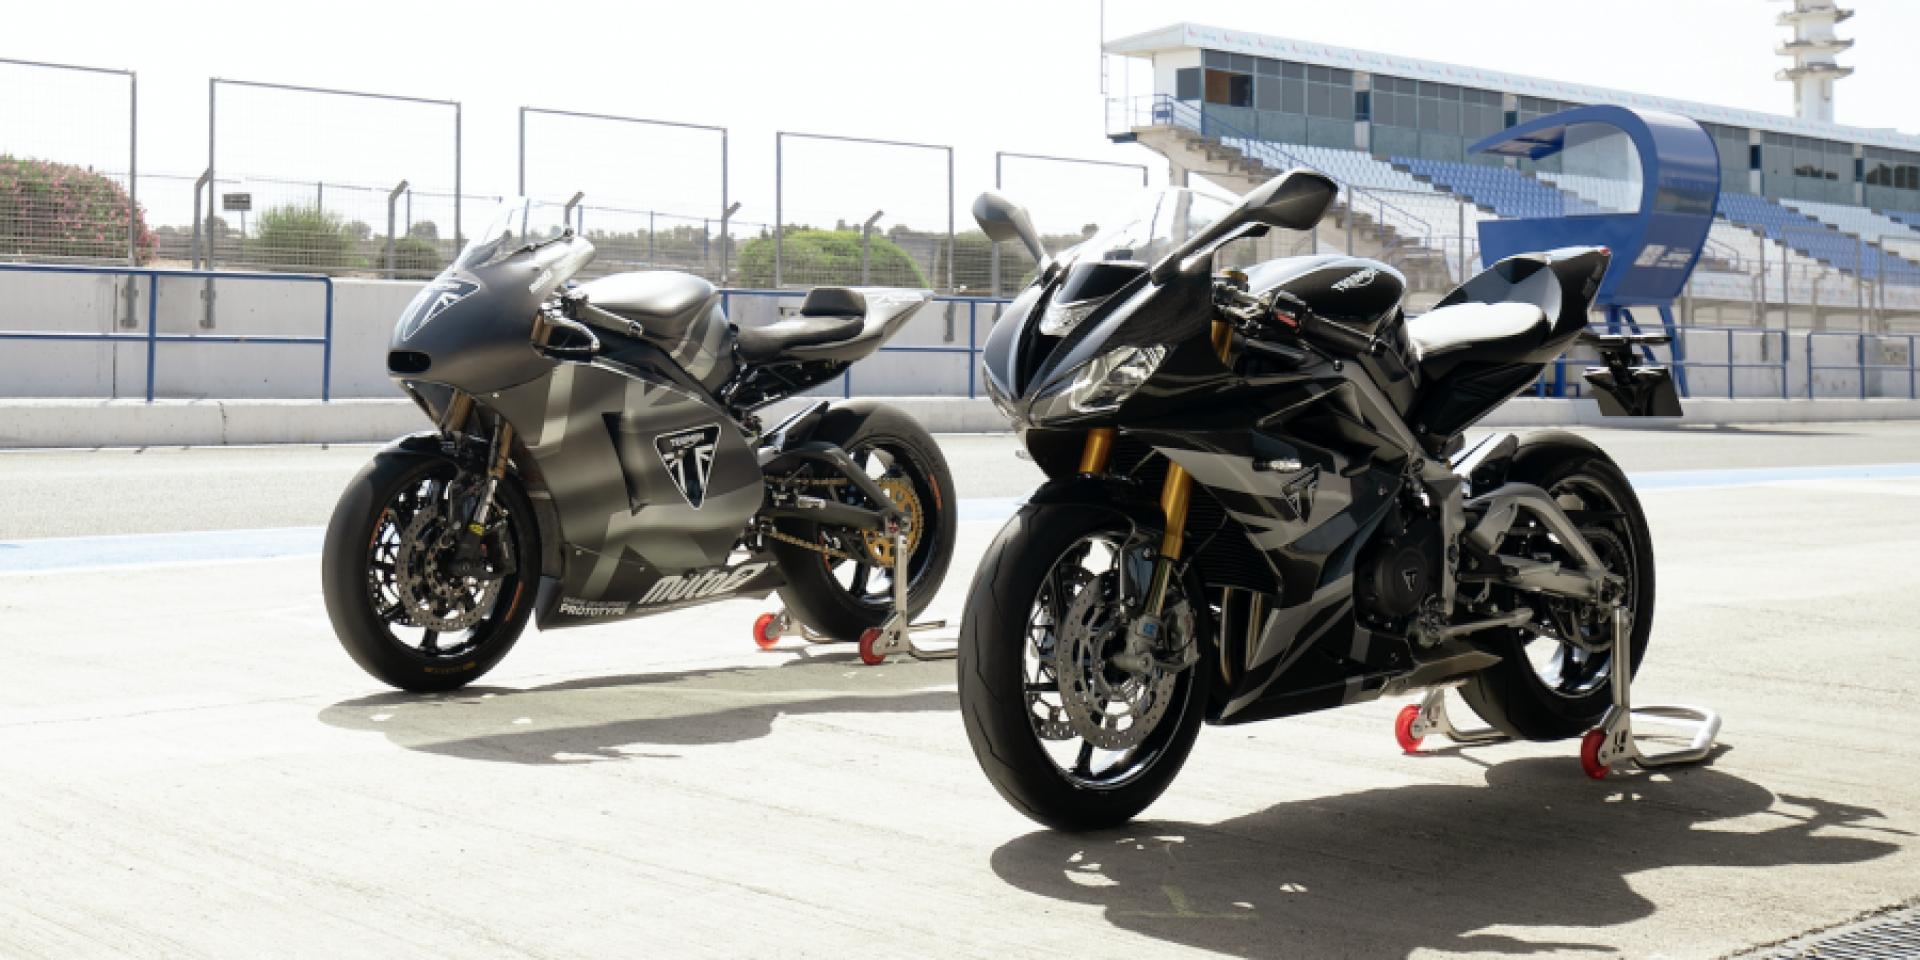 Silverstone的意外驚喜!Triumph Daytona Moto2 765 Limited Edition正式發表